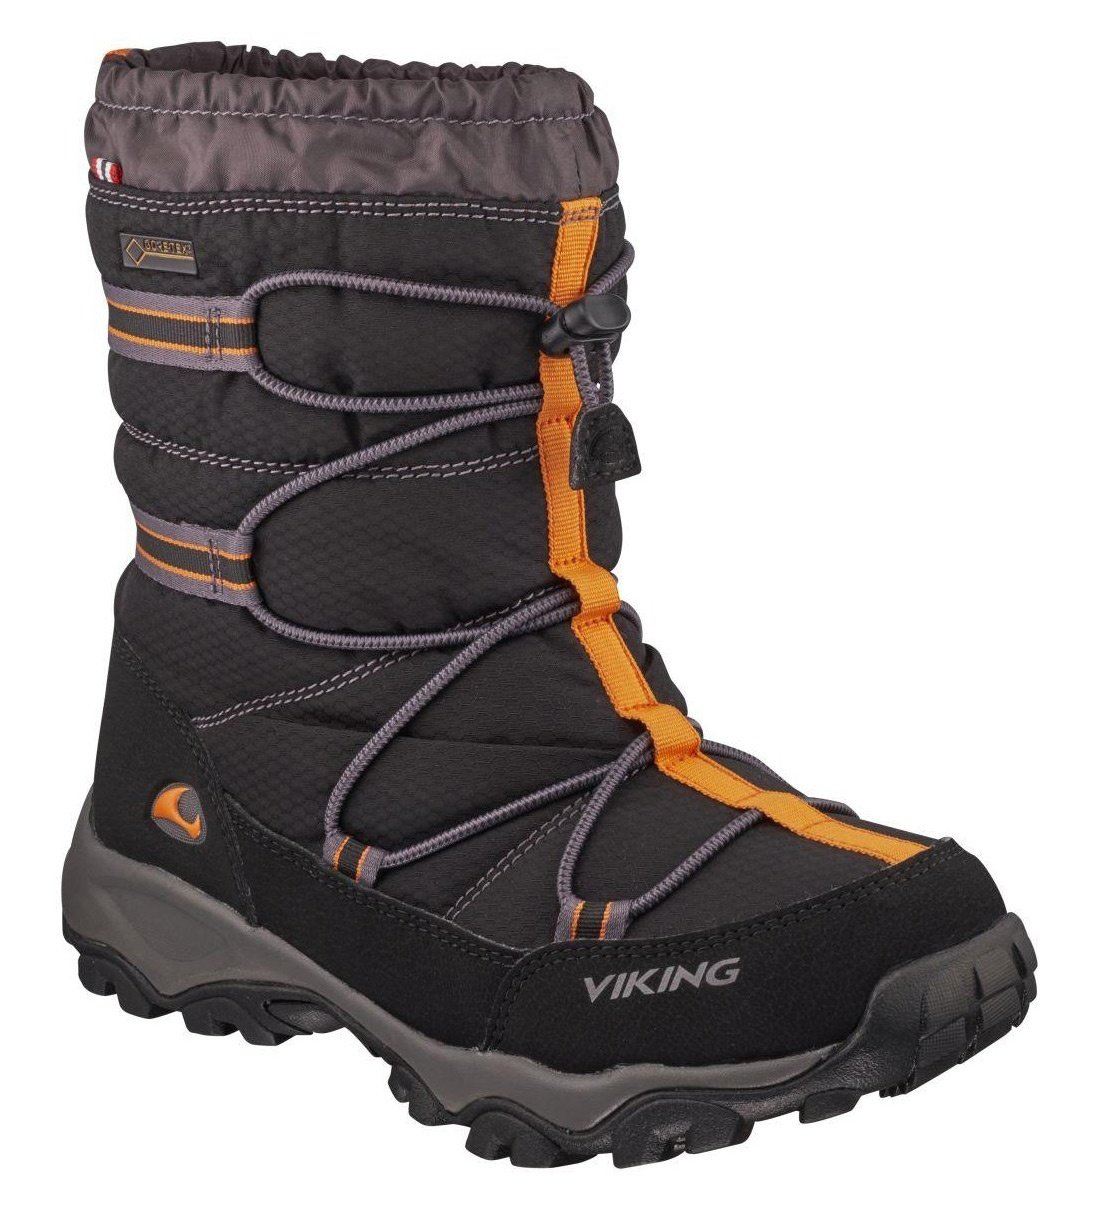 Ботинки зимние Viking TOFTE GTX 3-88120-00263 для мальчиков 46b07d3b769